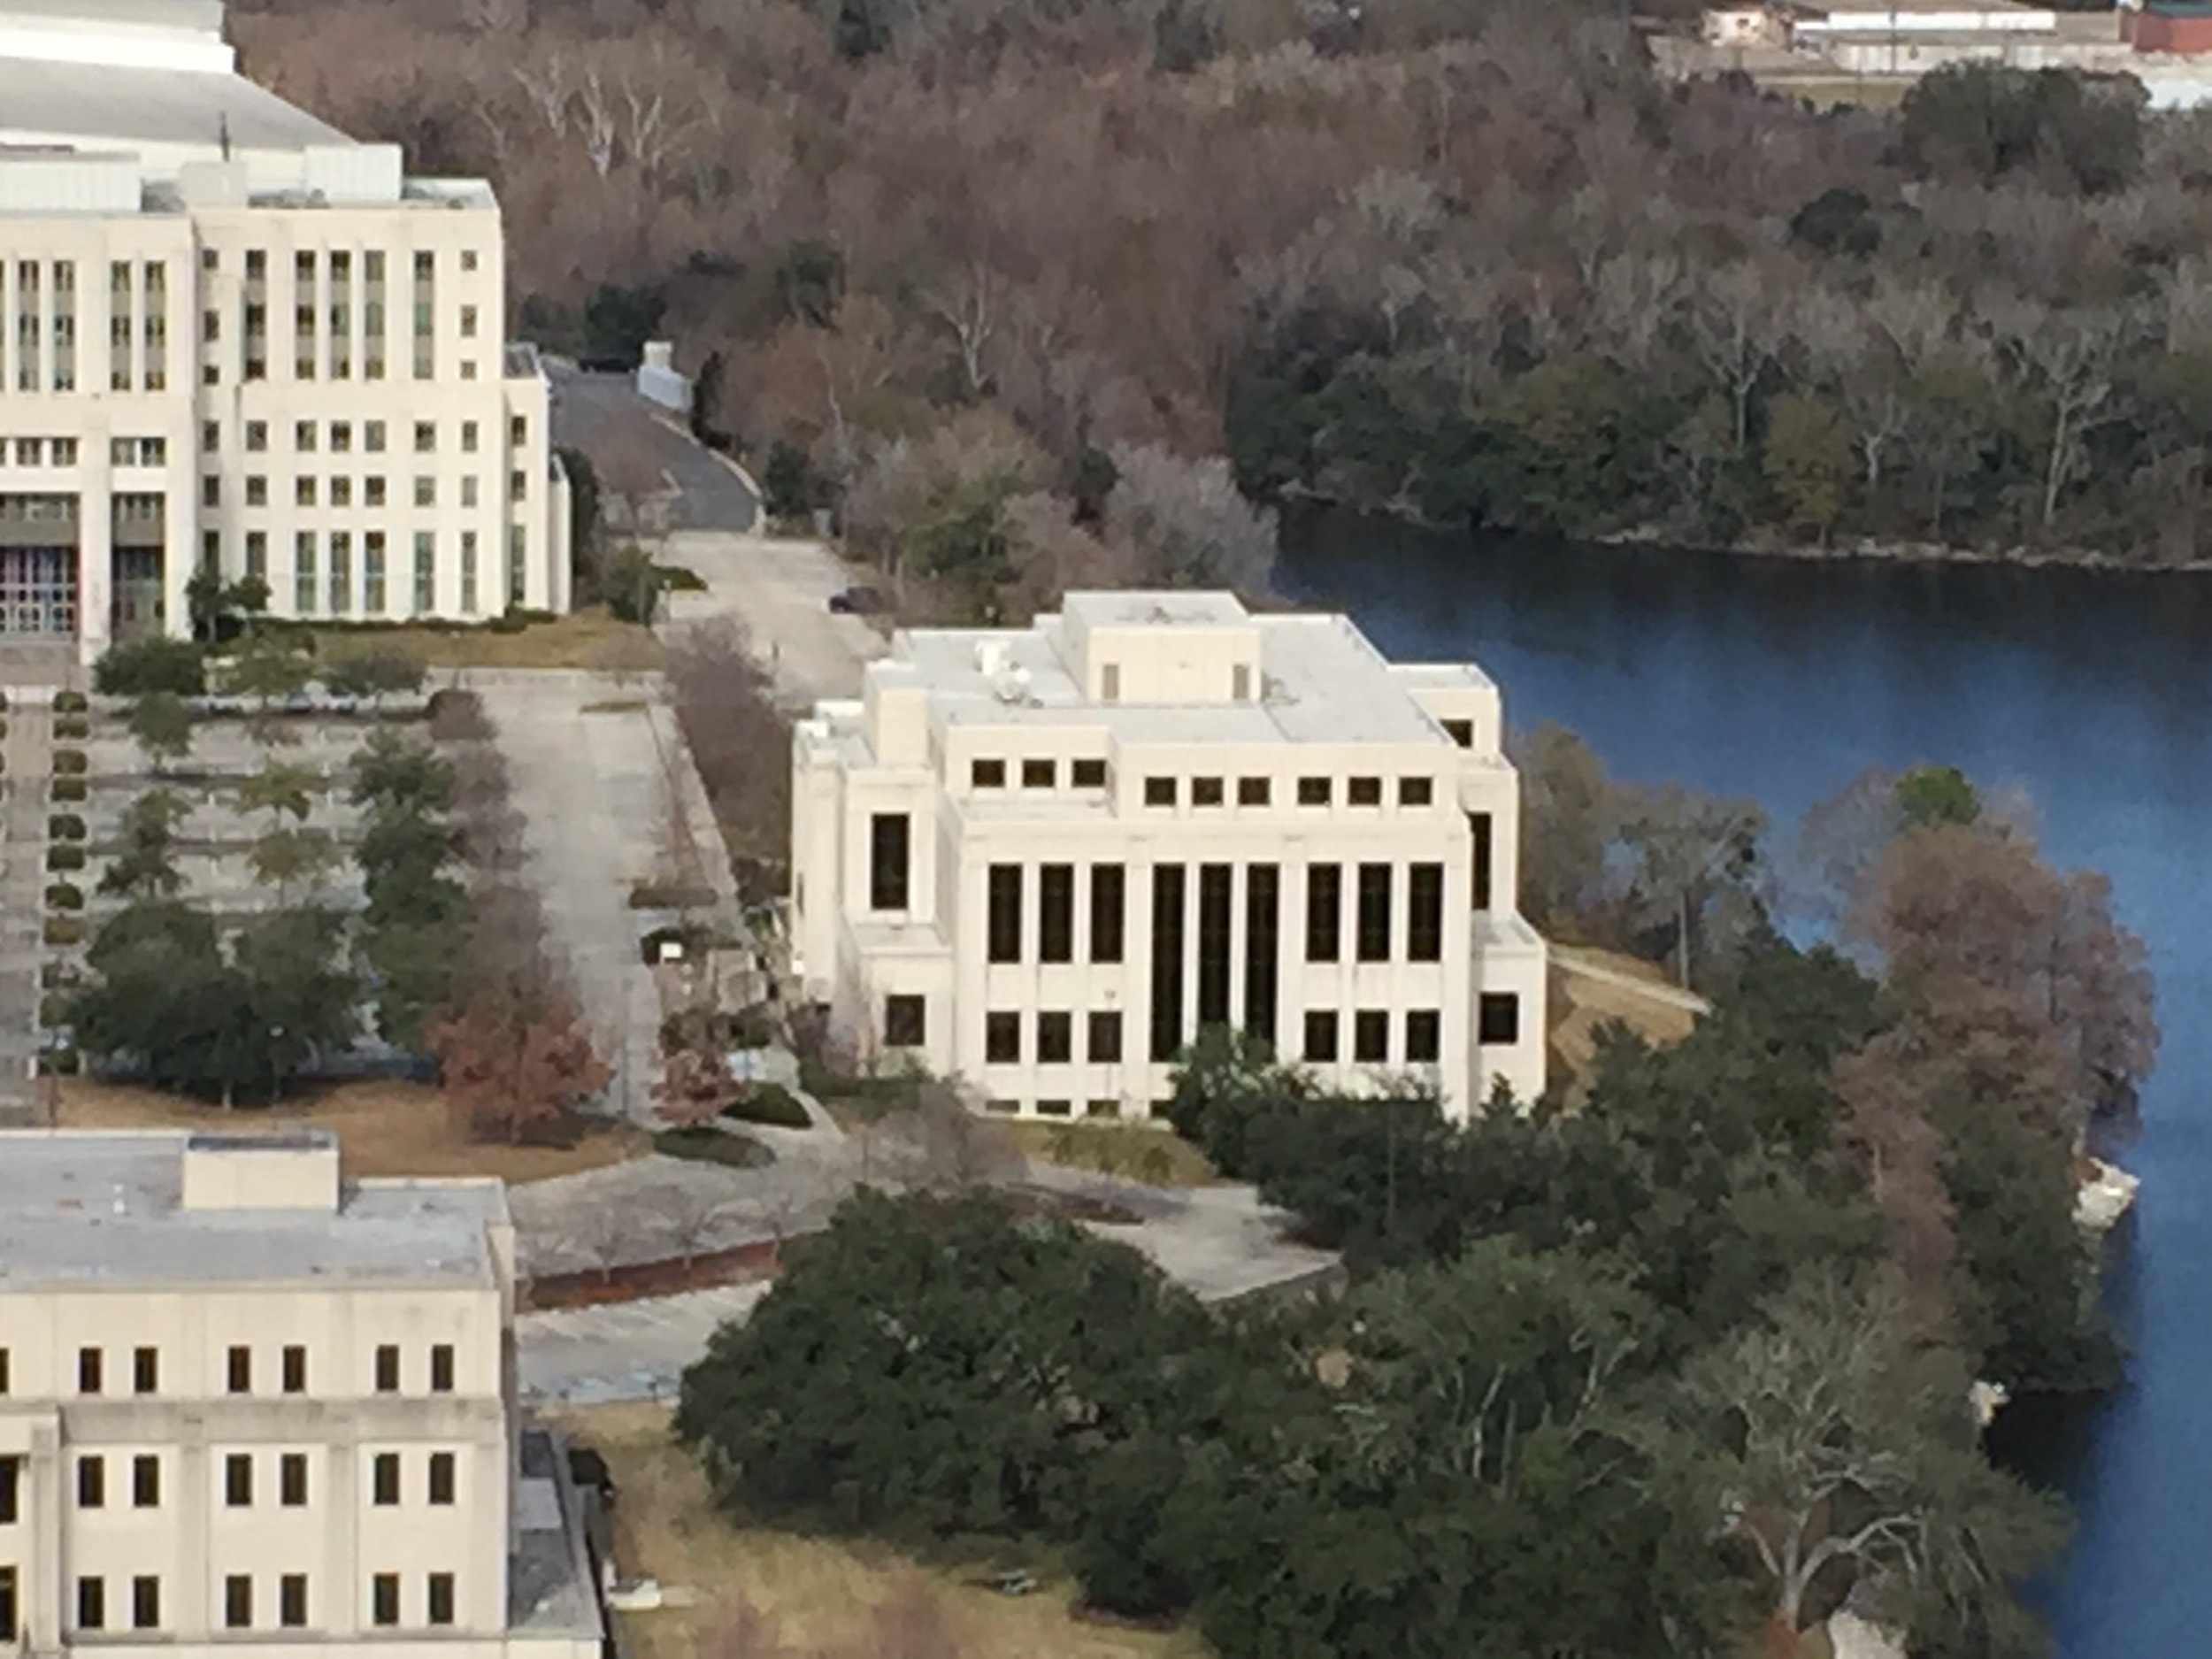 Poydras (Insurance) Office Building